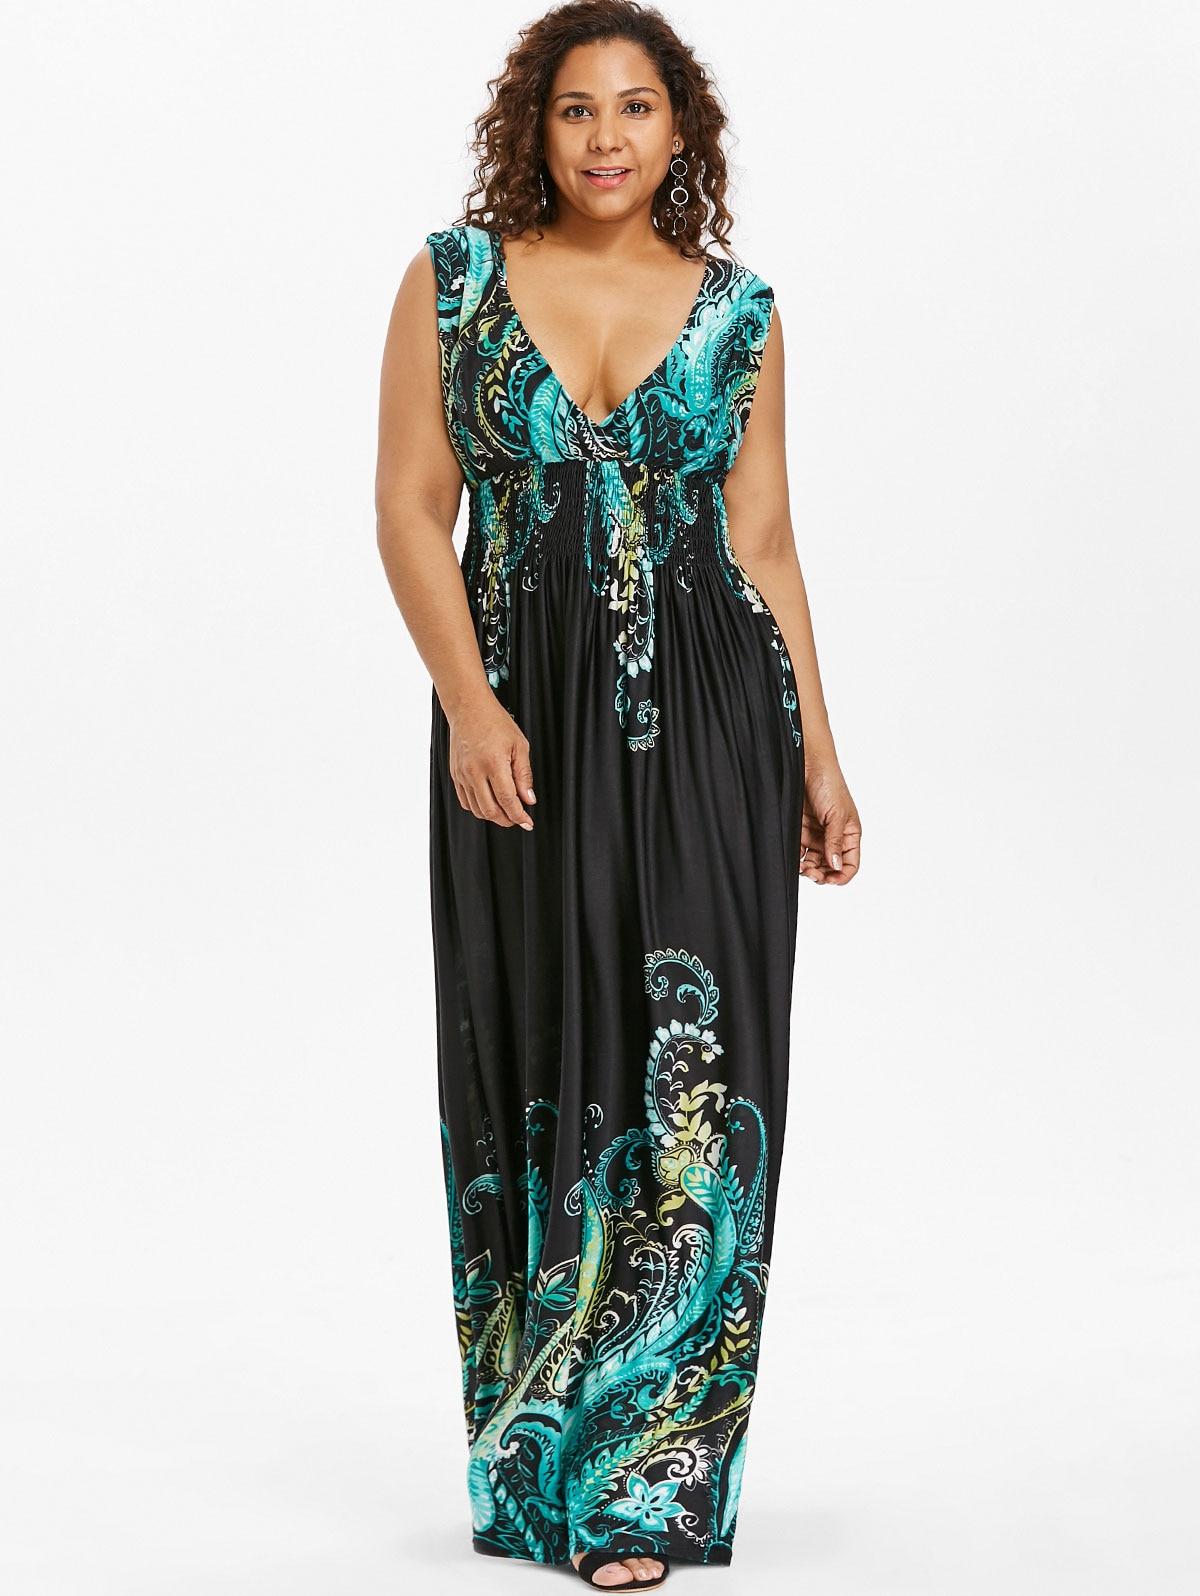 Wipalo Summer Paisley Plunge V Neck Bohemian Plus Size Women Dress ... c57c7e9e30c2